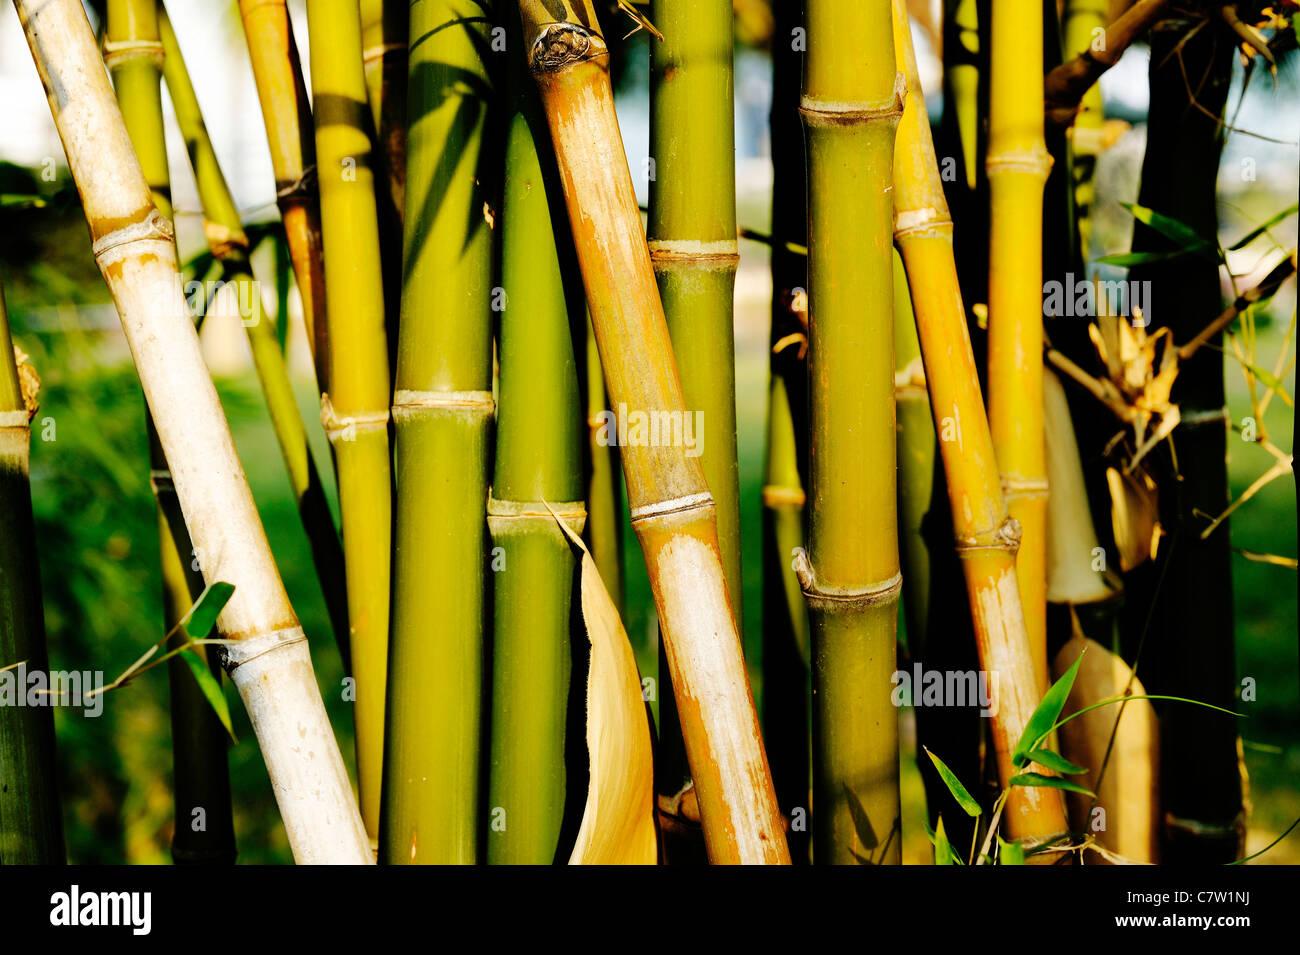 Bamboo In Garden   Stock Image